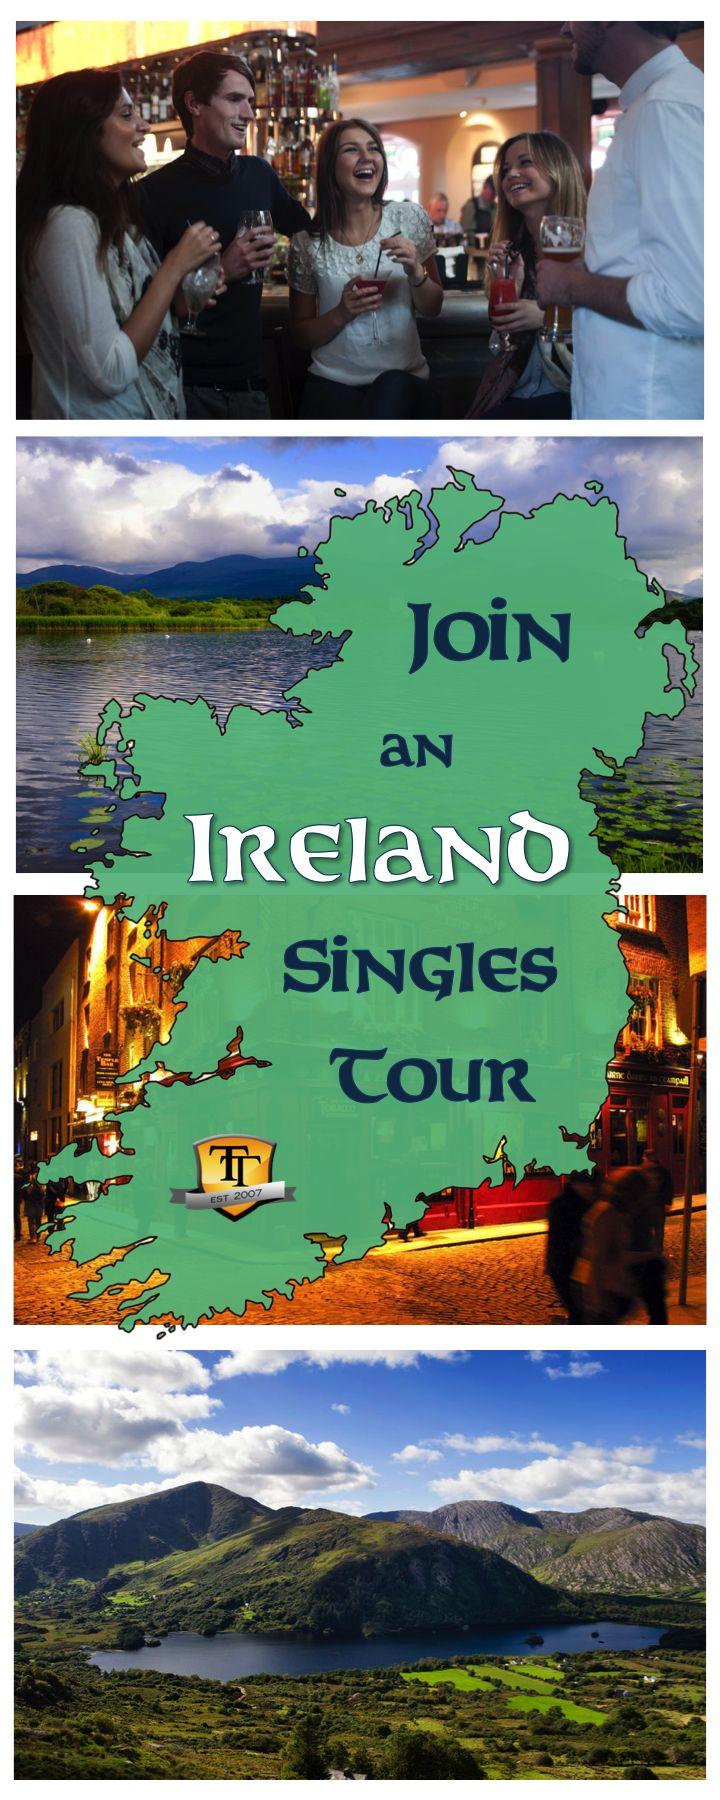 Free irish dating chat